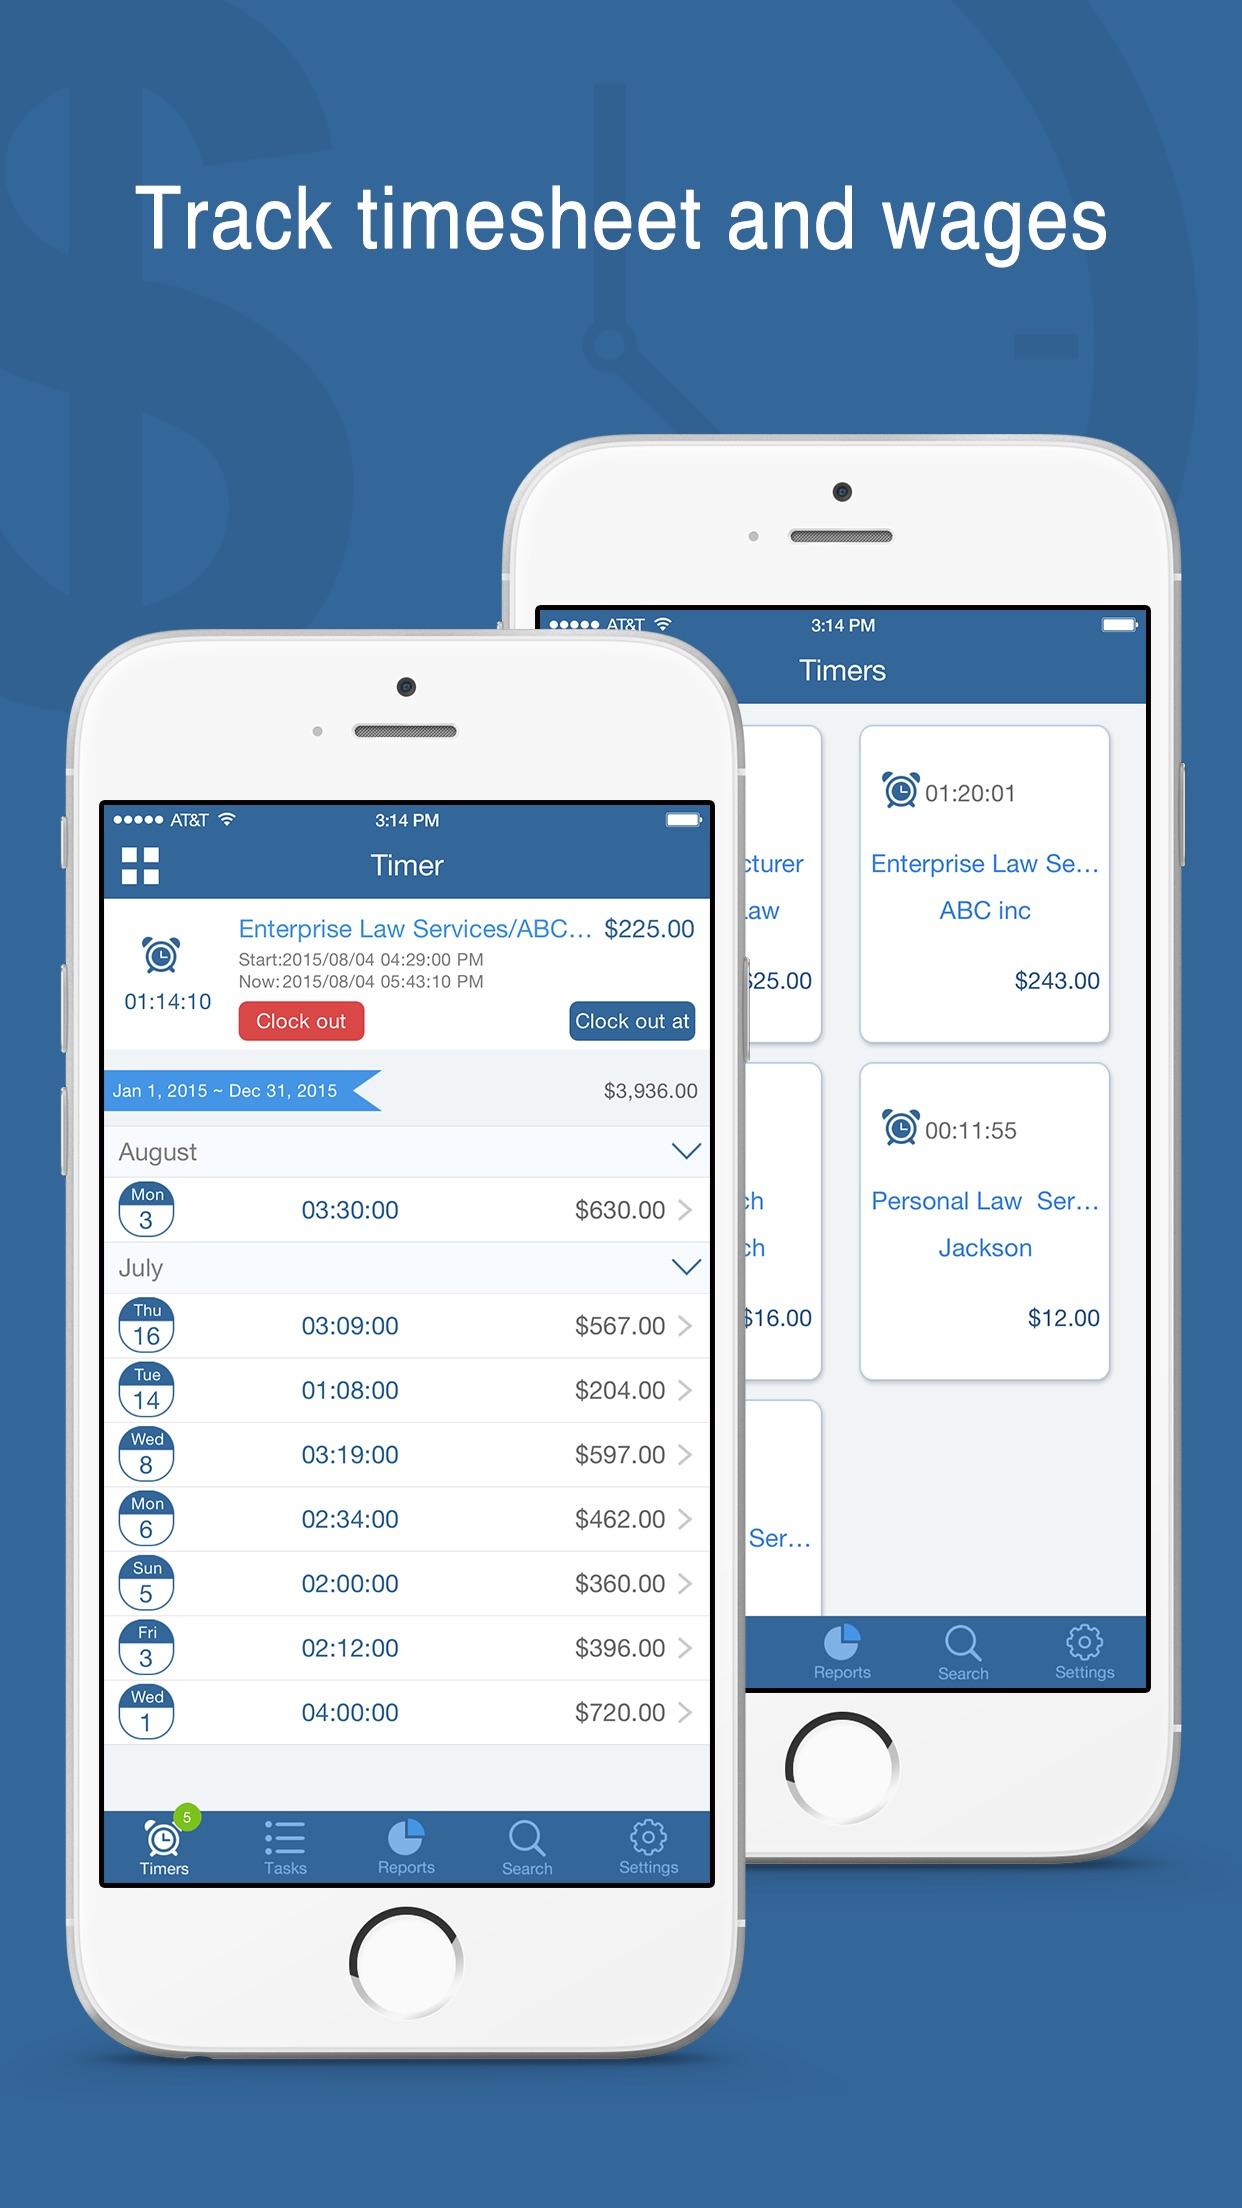 Worktime Tracker - Timesheet and Billing Manager Screenshot